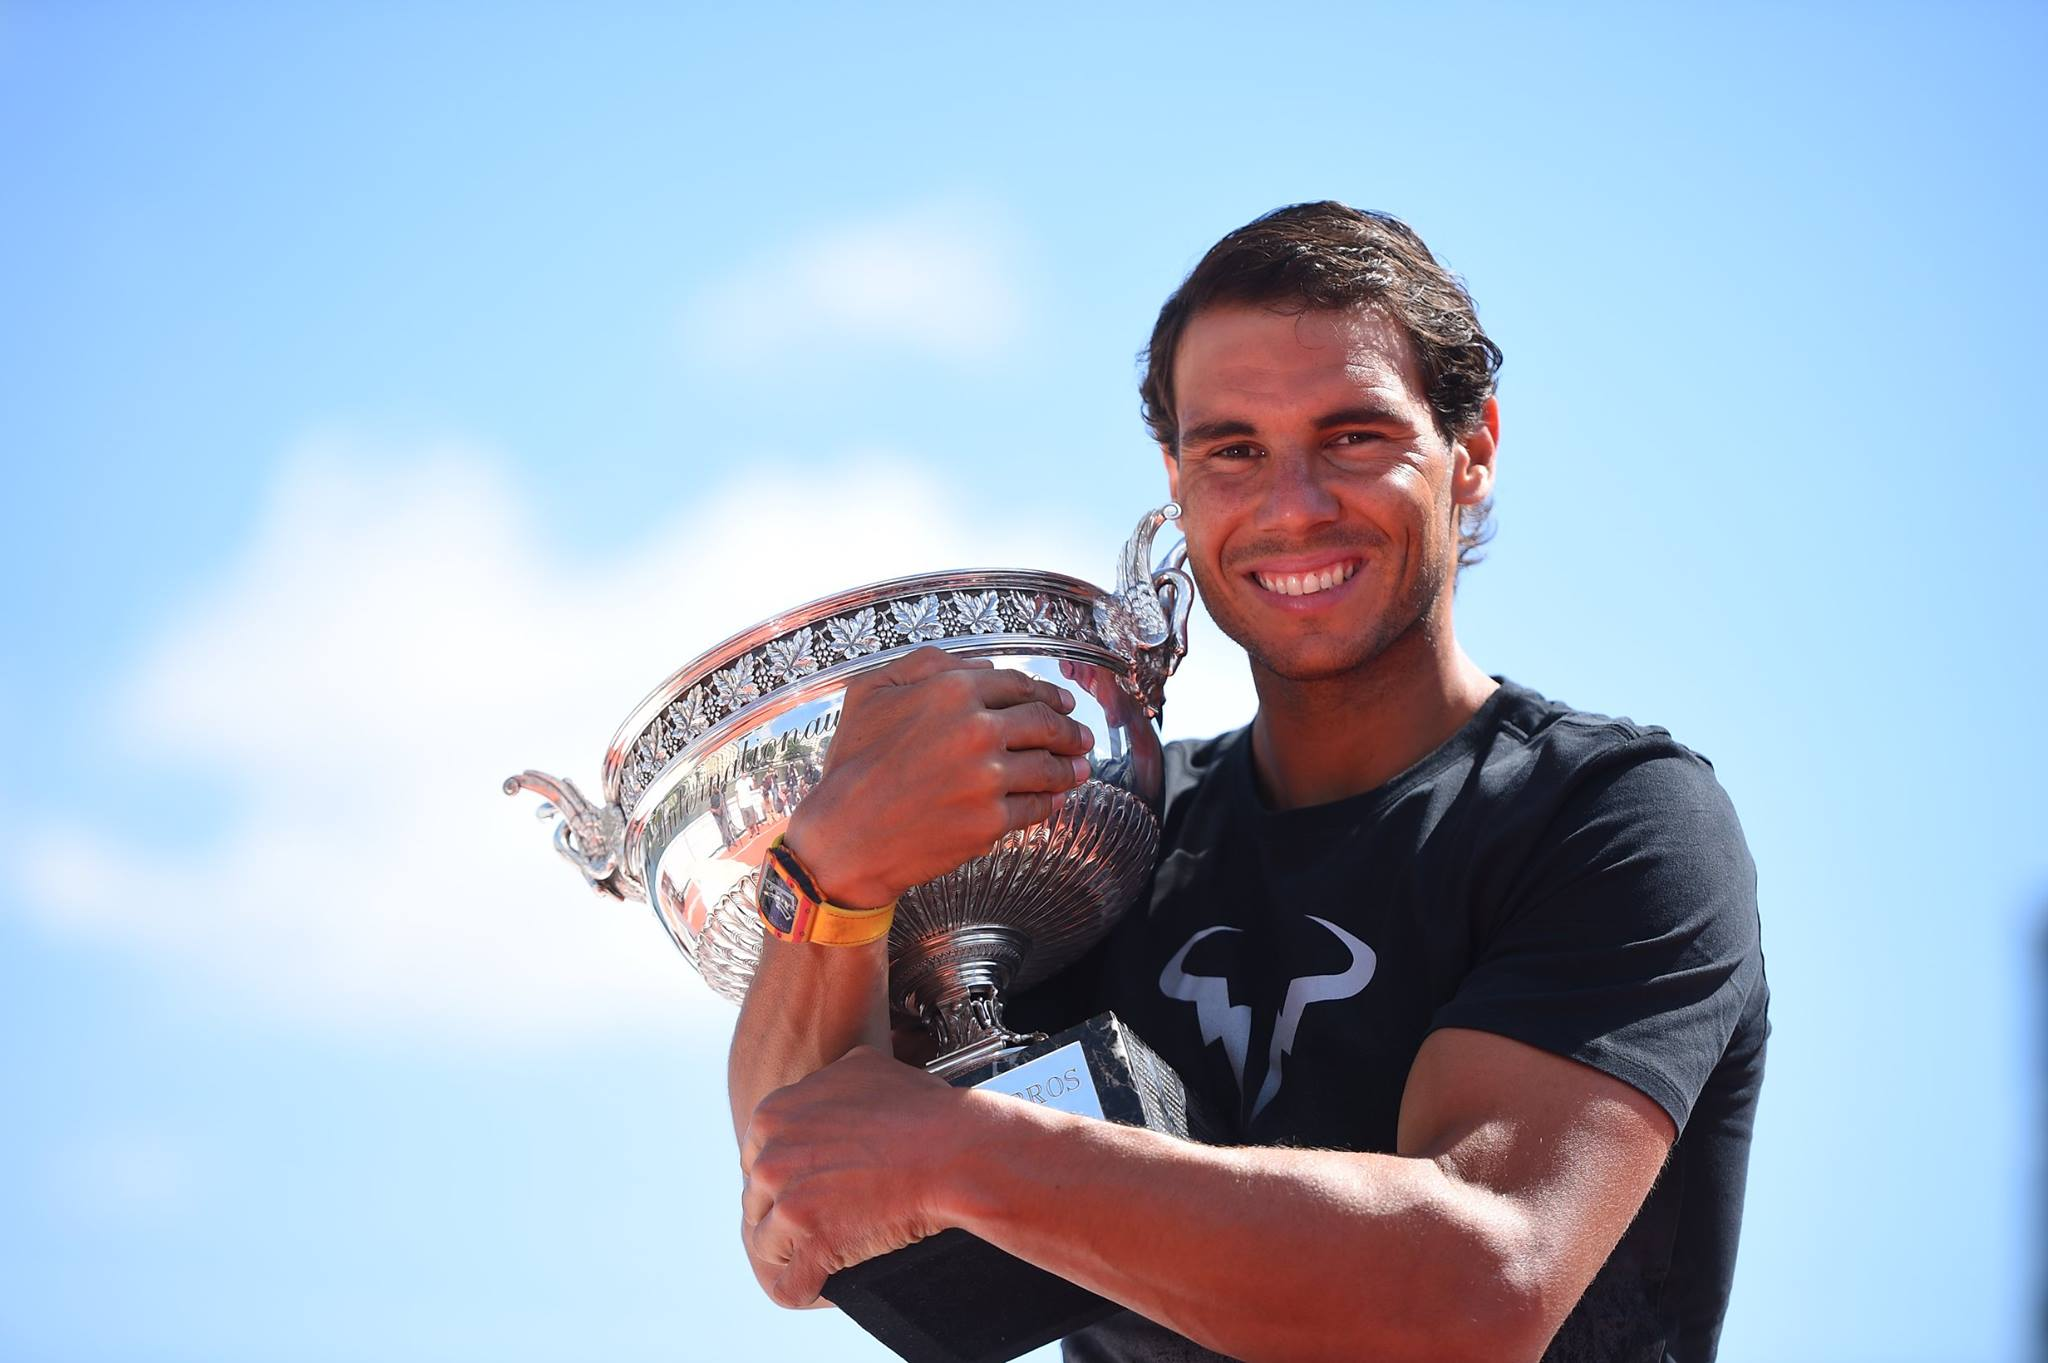 PHOTOS: Rafael Nadal's Roland Garros trophy shoot – Rafael ...